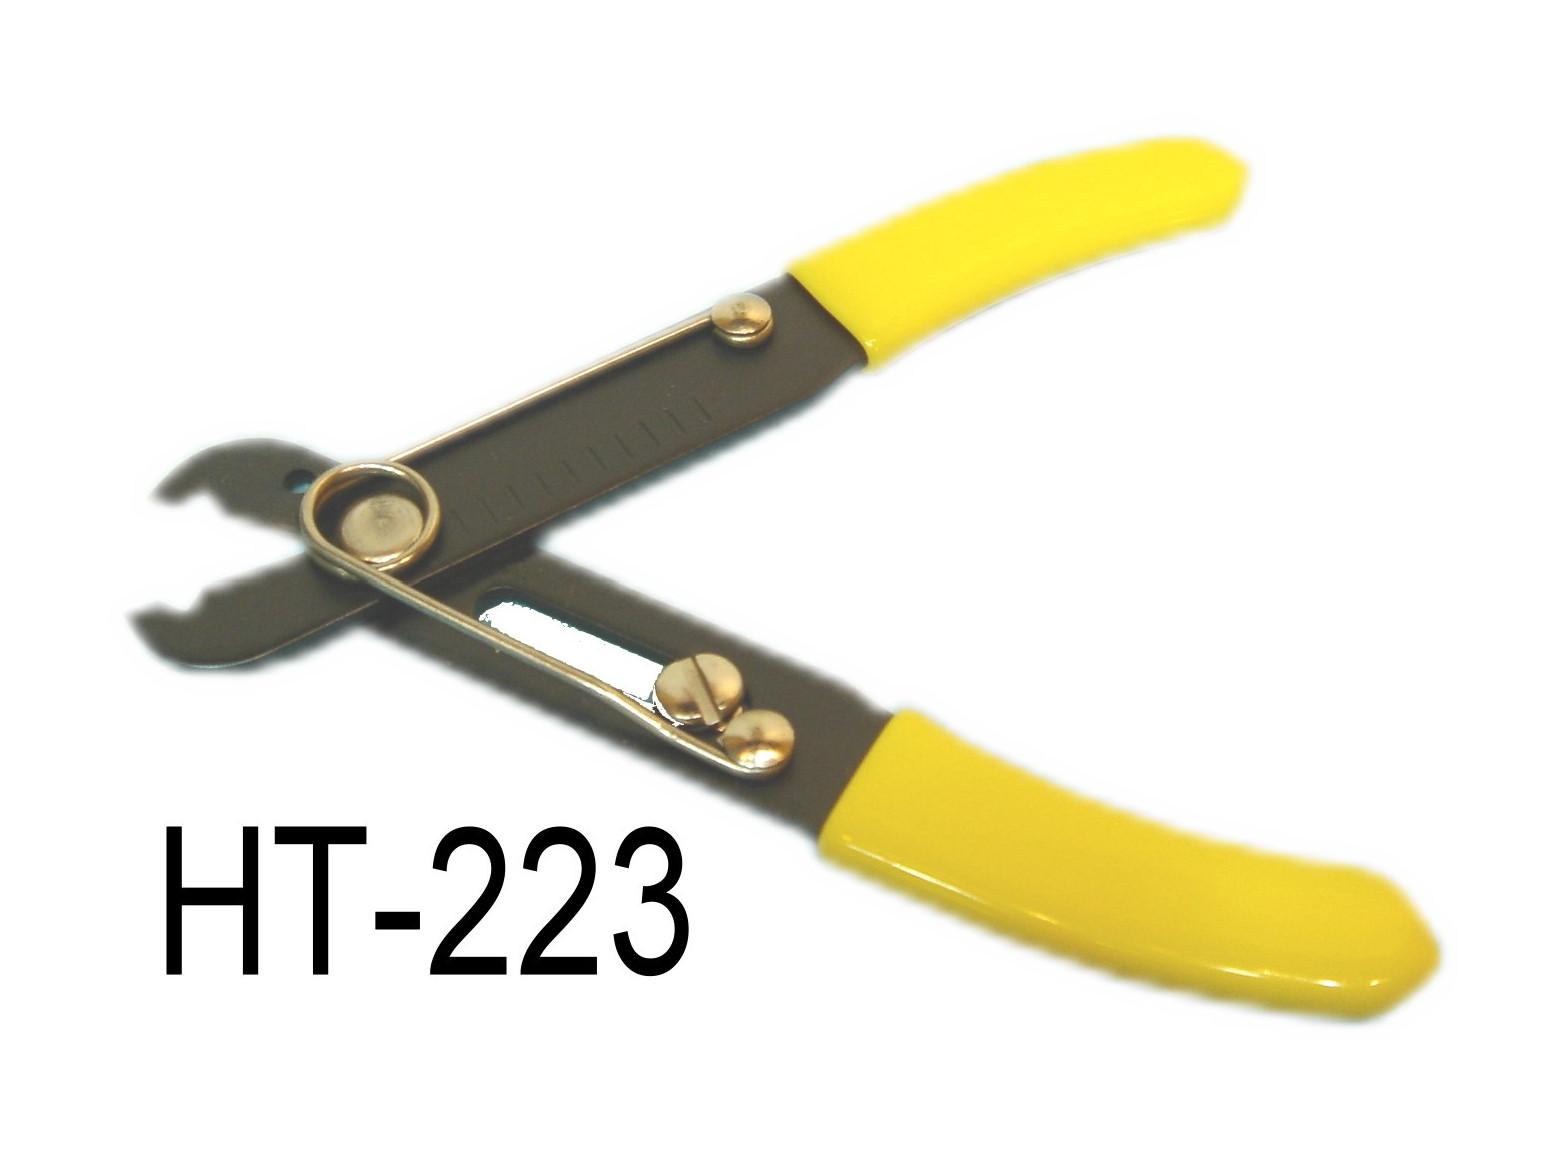 HT-223